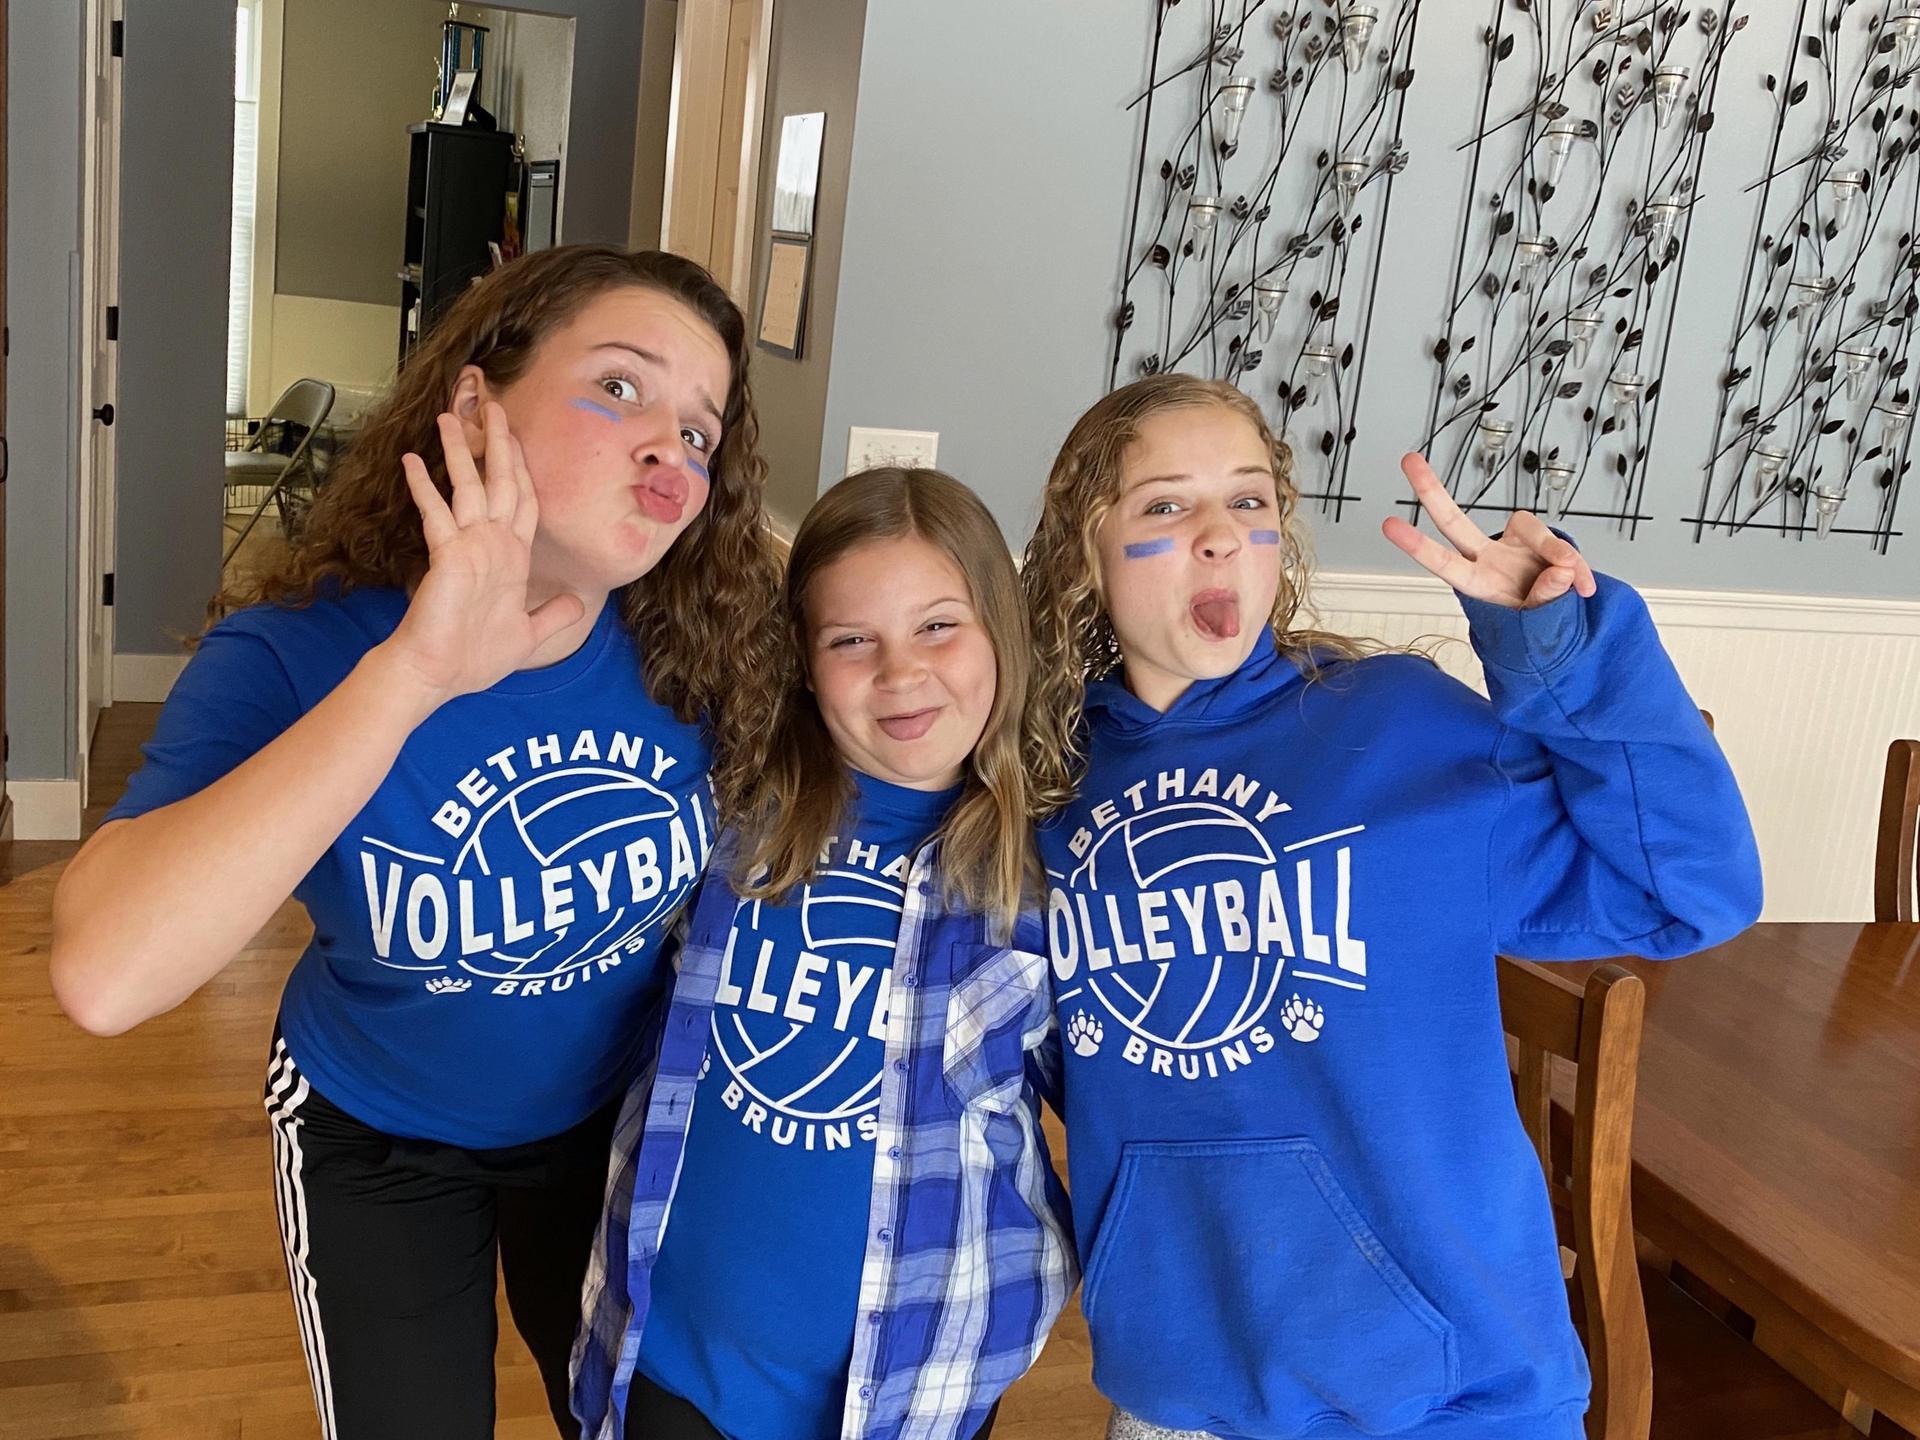 3 girls school spirit